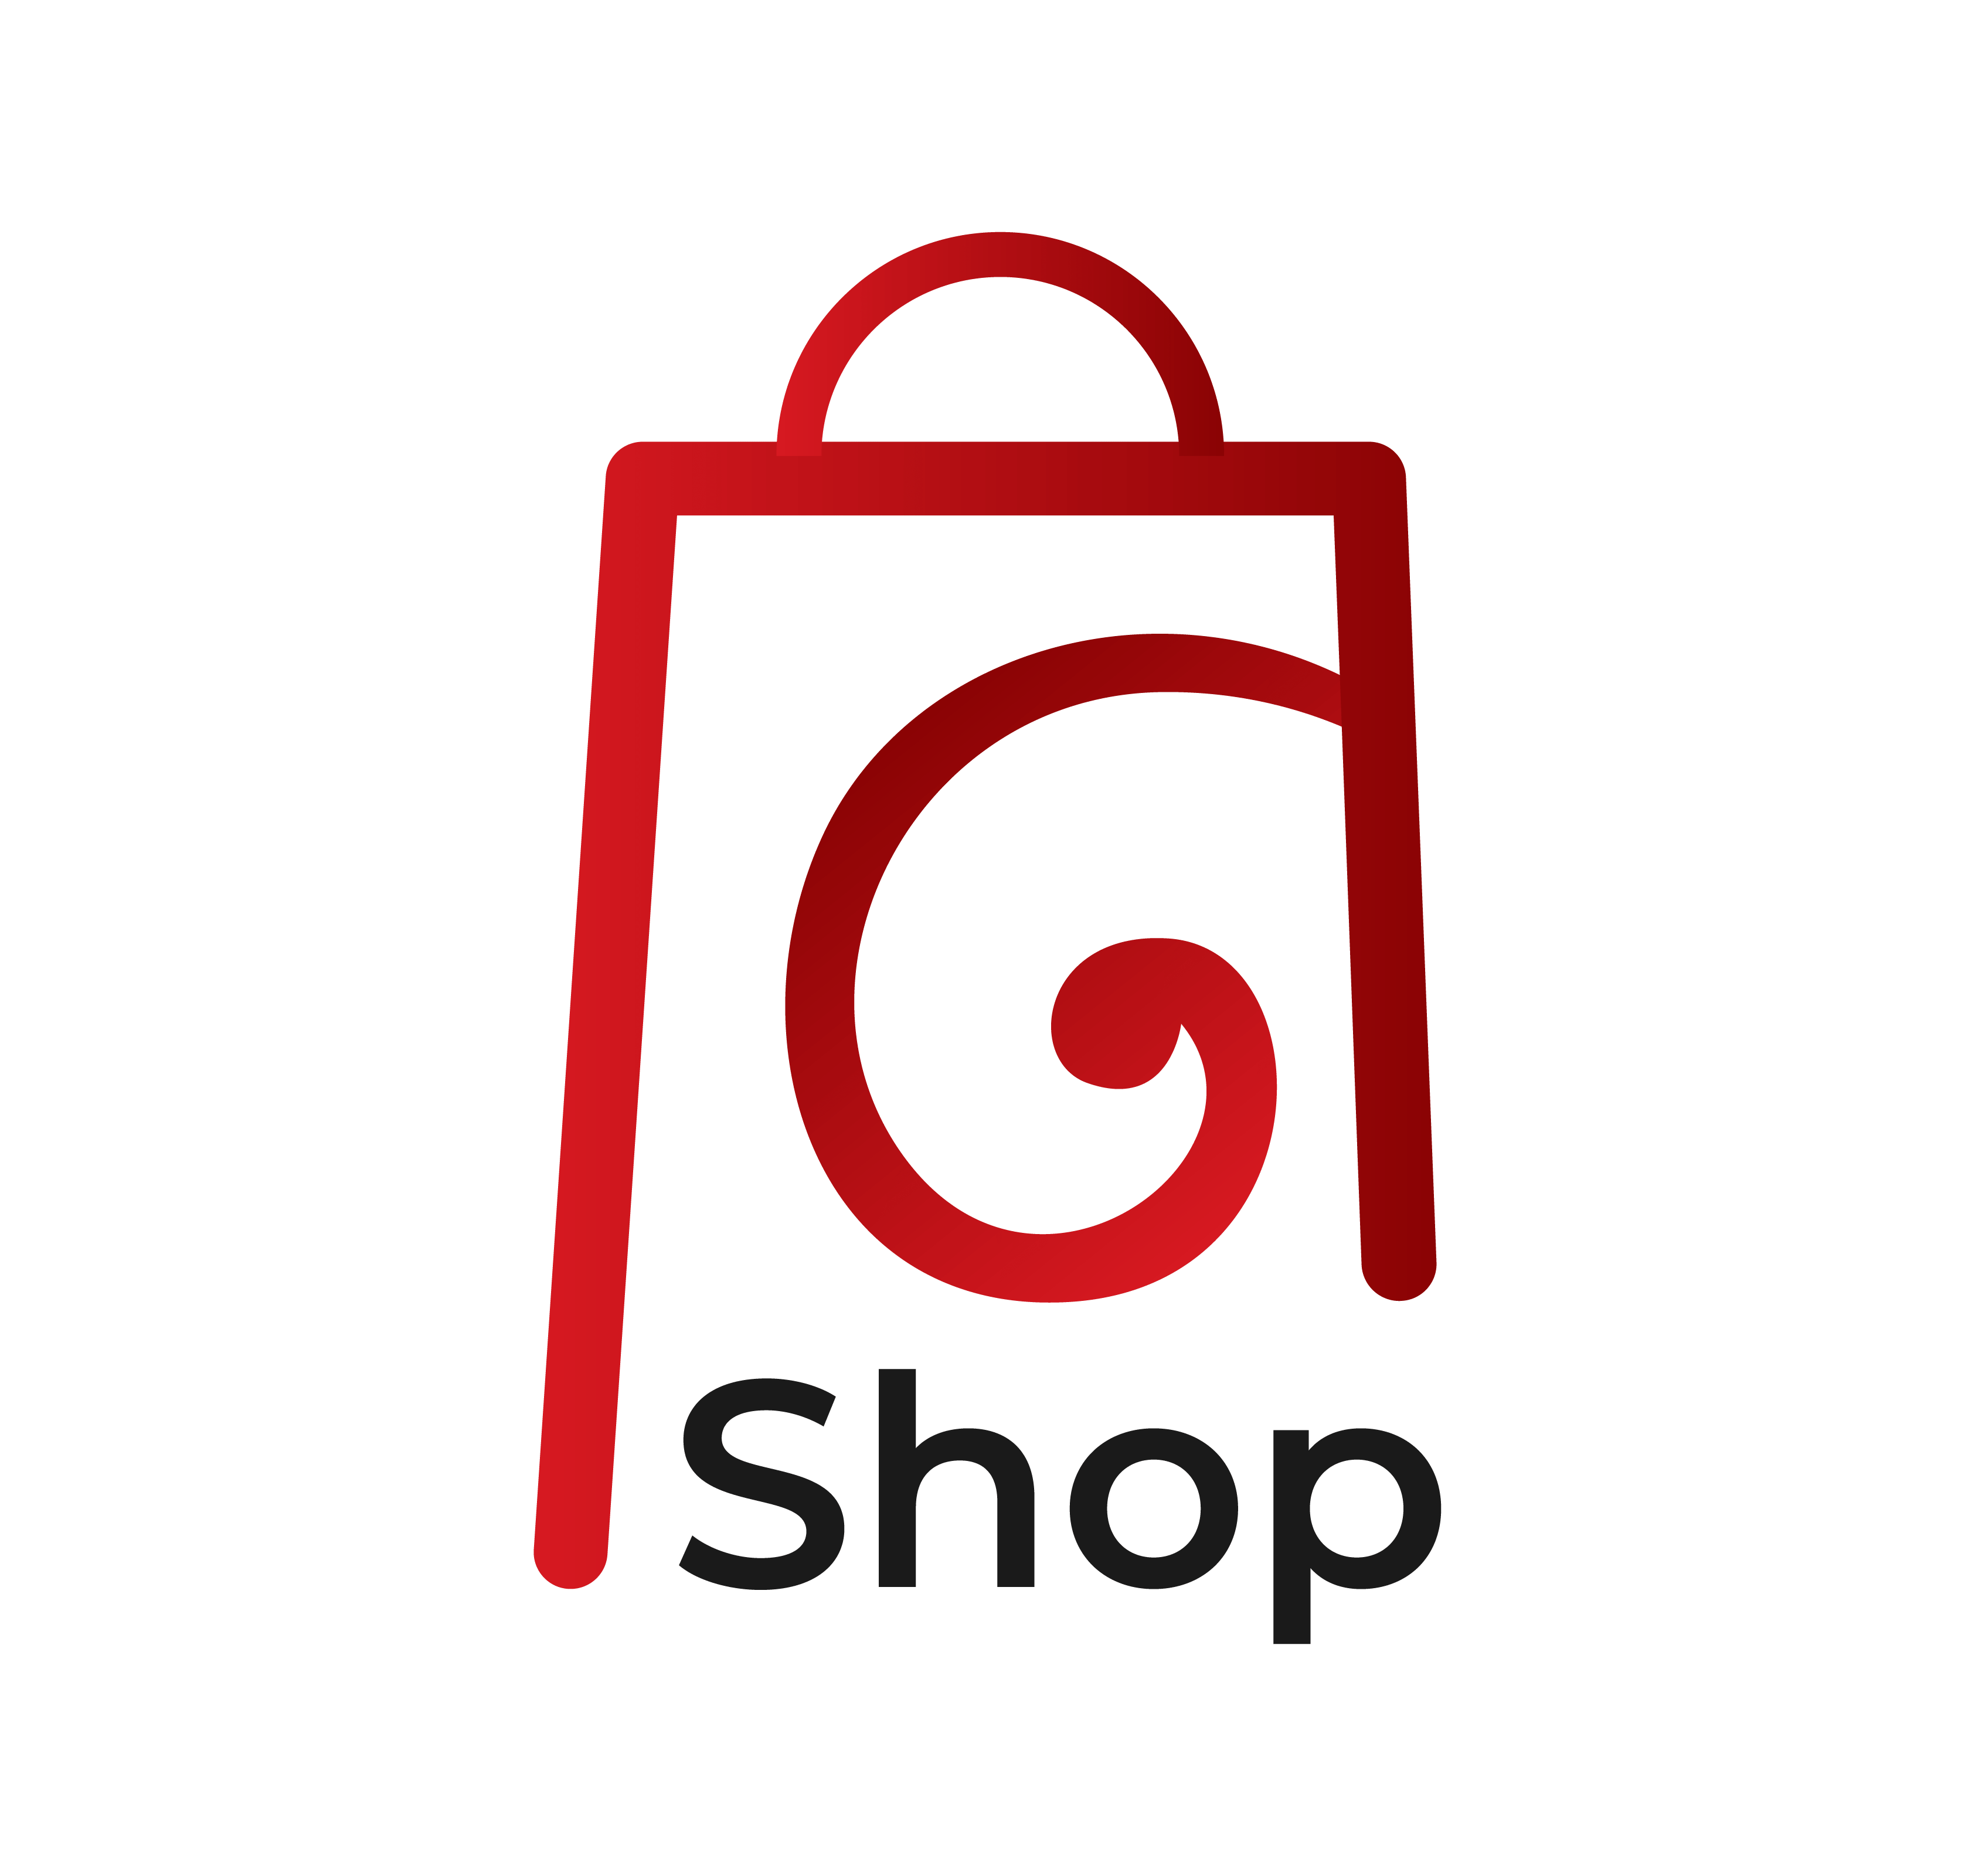 Derana Shop